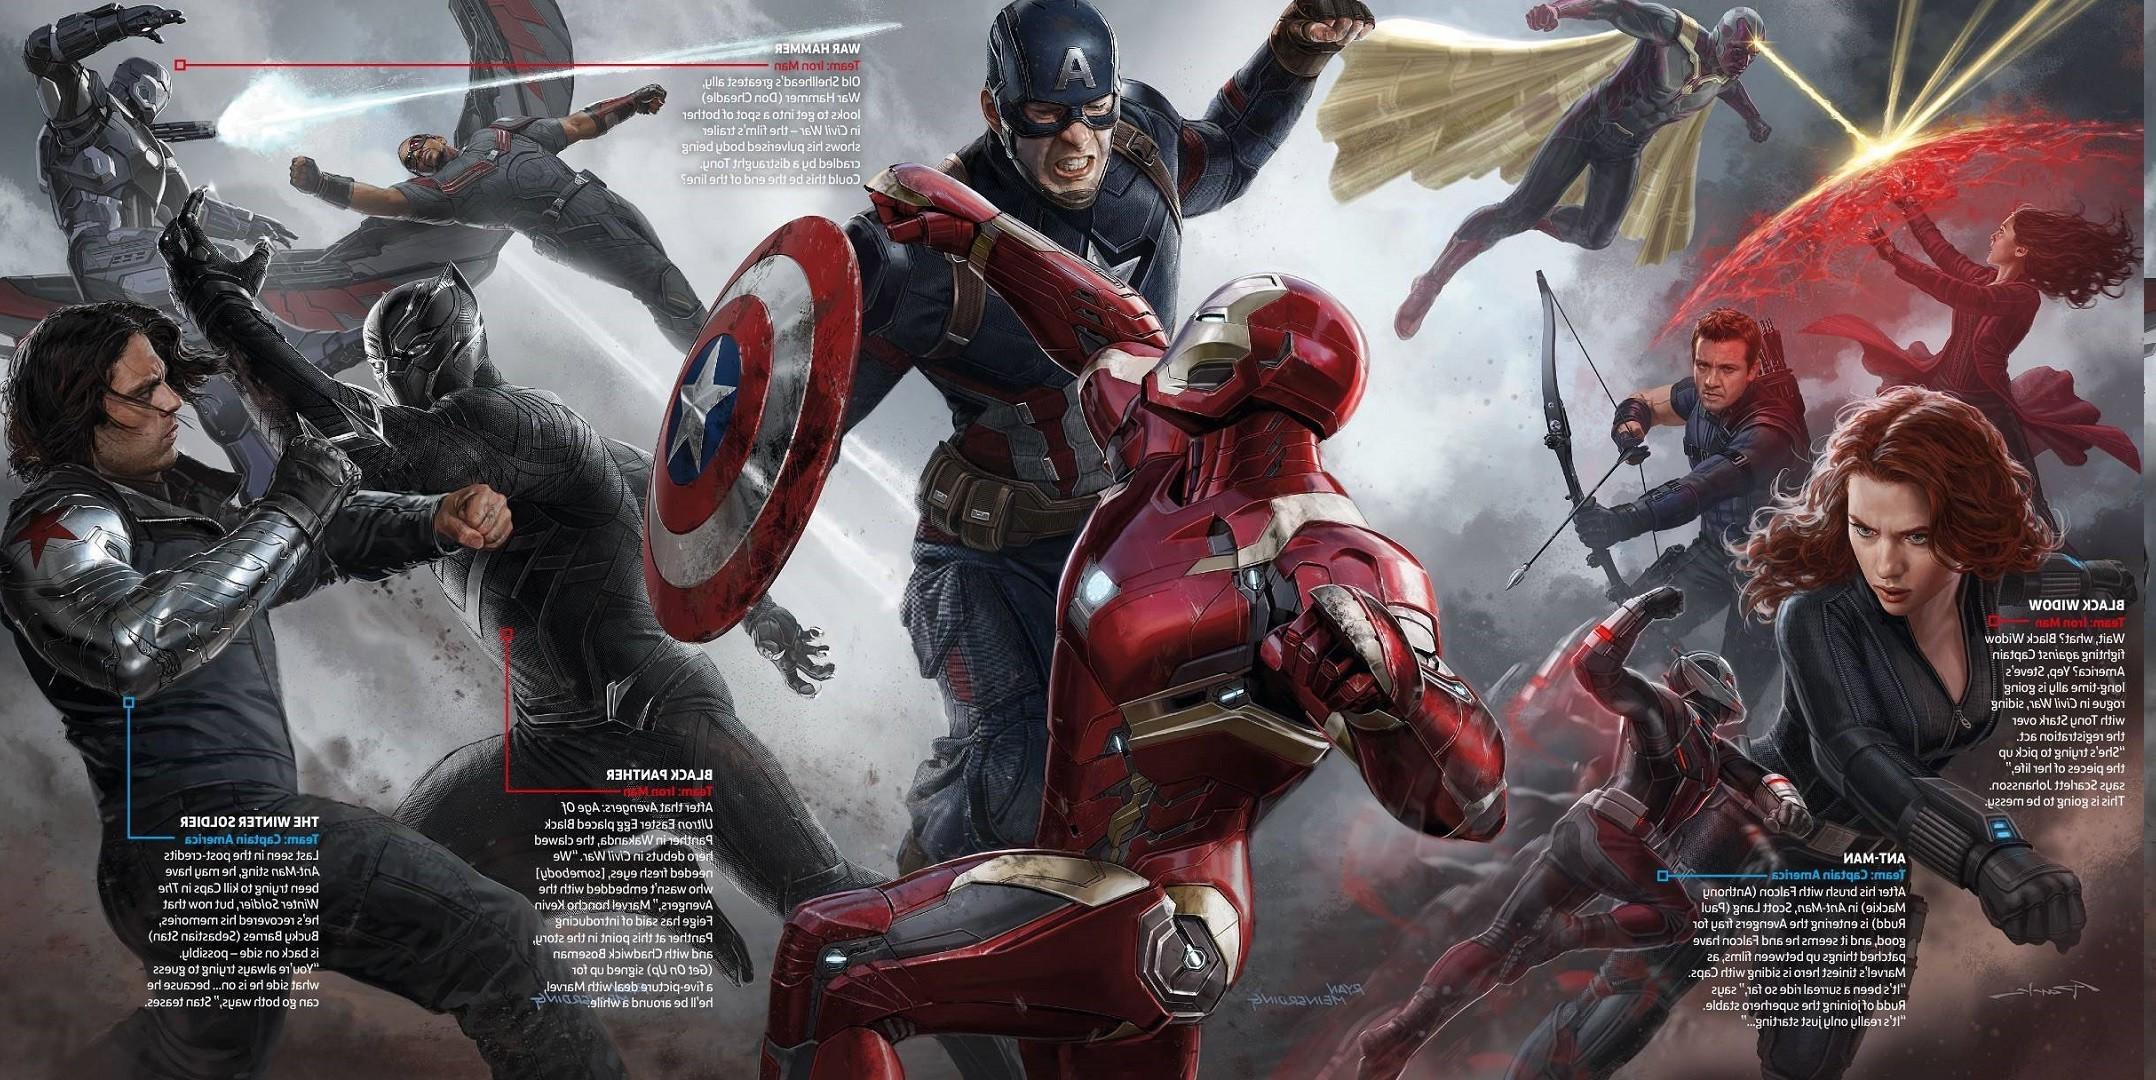 Best Marvel Civil War Wallpaper hd nature wallpapers for pc 1080p .